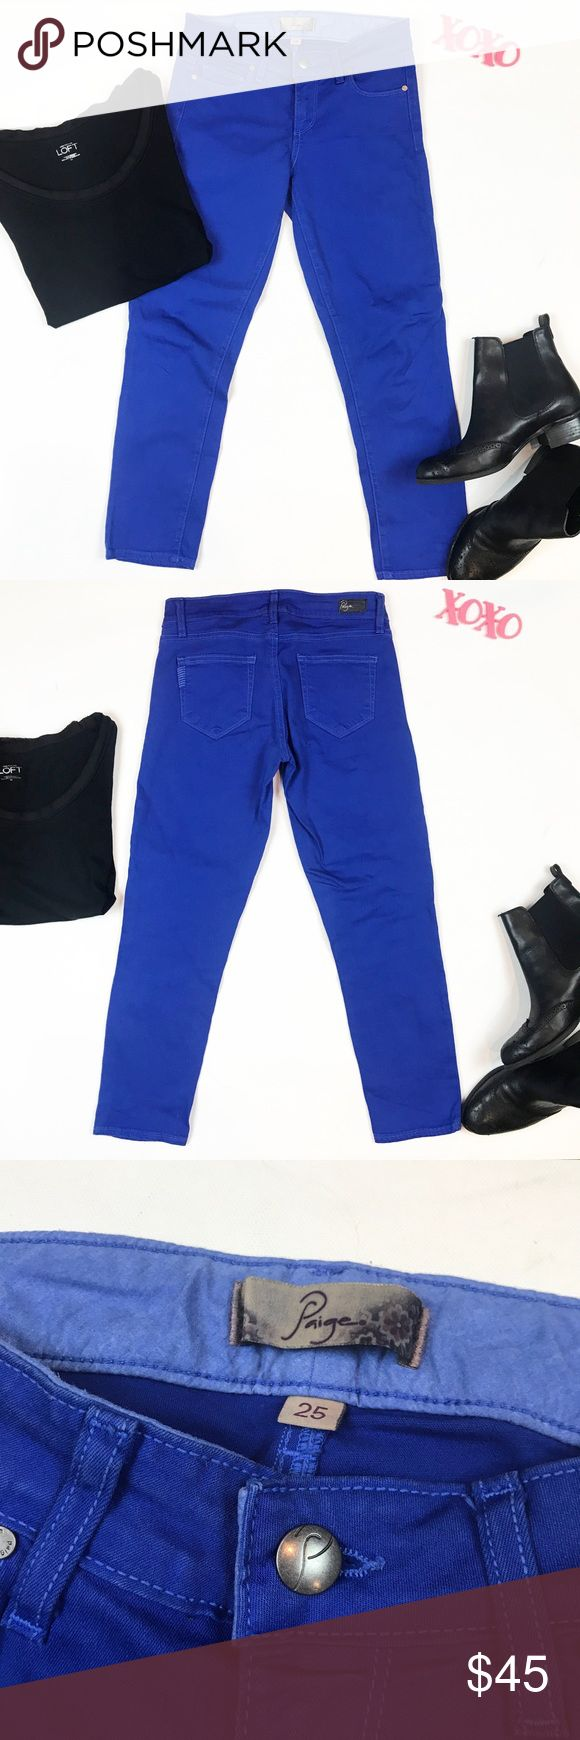 Paige cobalt blue skinny crop jeans size 25 Paige cobalt blue skinny crop jeans size 25. Excellent condition! Waist 13, rise 7.5, inseam 24. Cotton spandex so they have stretch! Perfect spring color cobalt blue skinny crop Paige jeans! Paige Jeans Jeans Ankle & Cropped